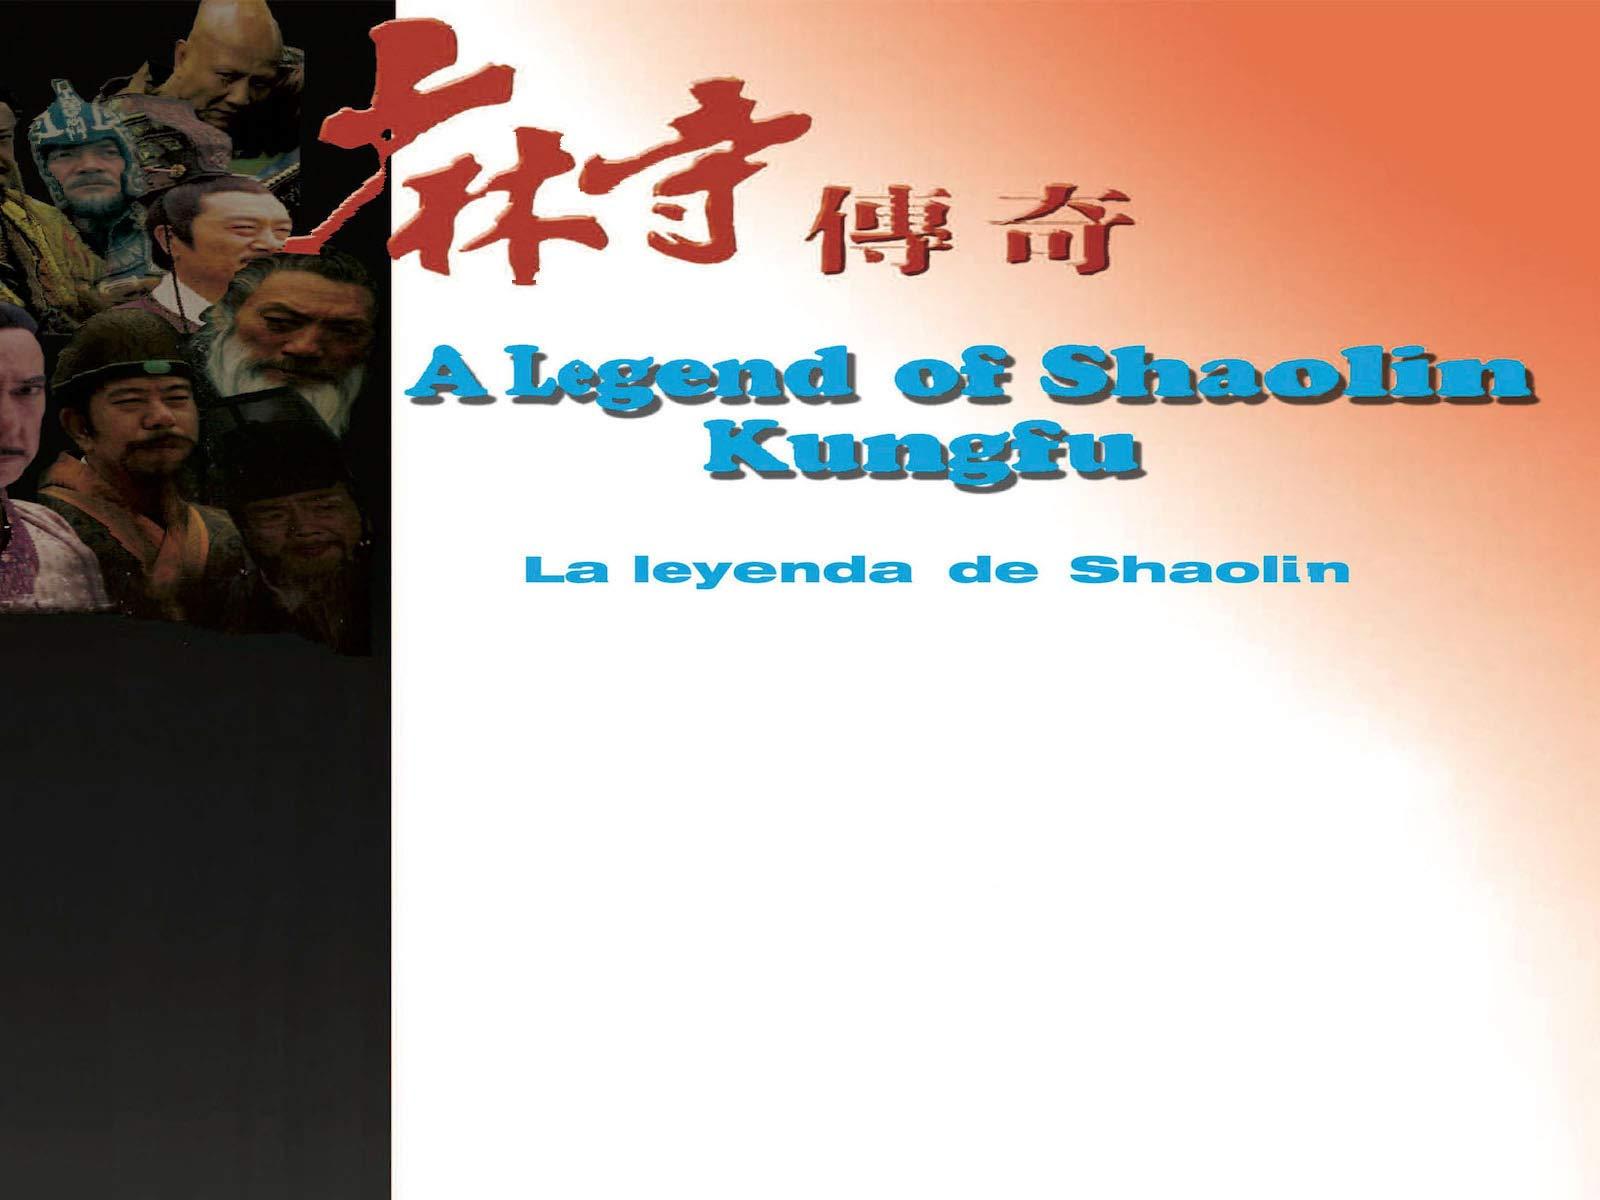 A Legend of Shaolin KungFu